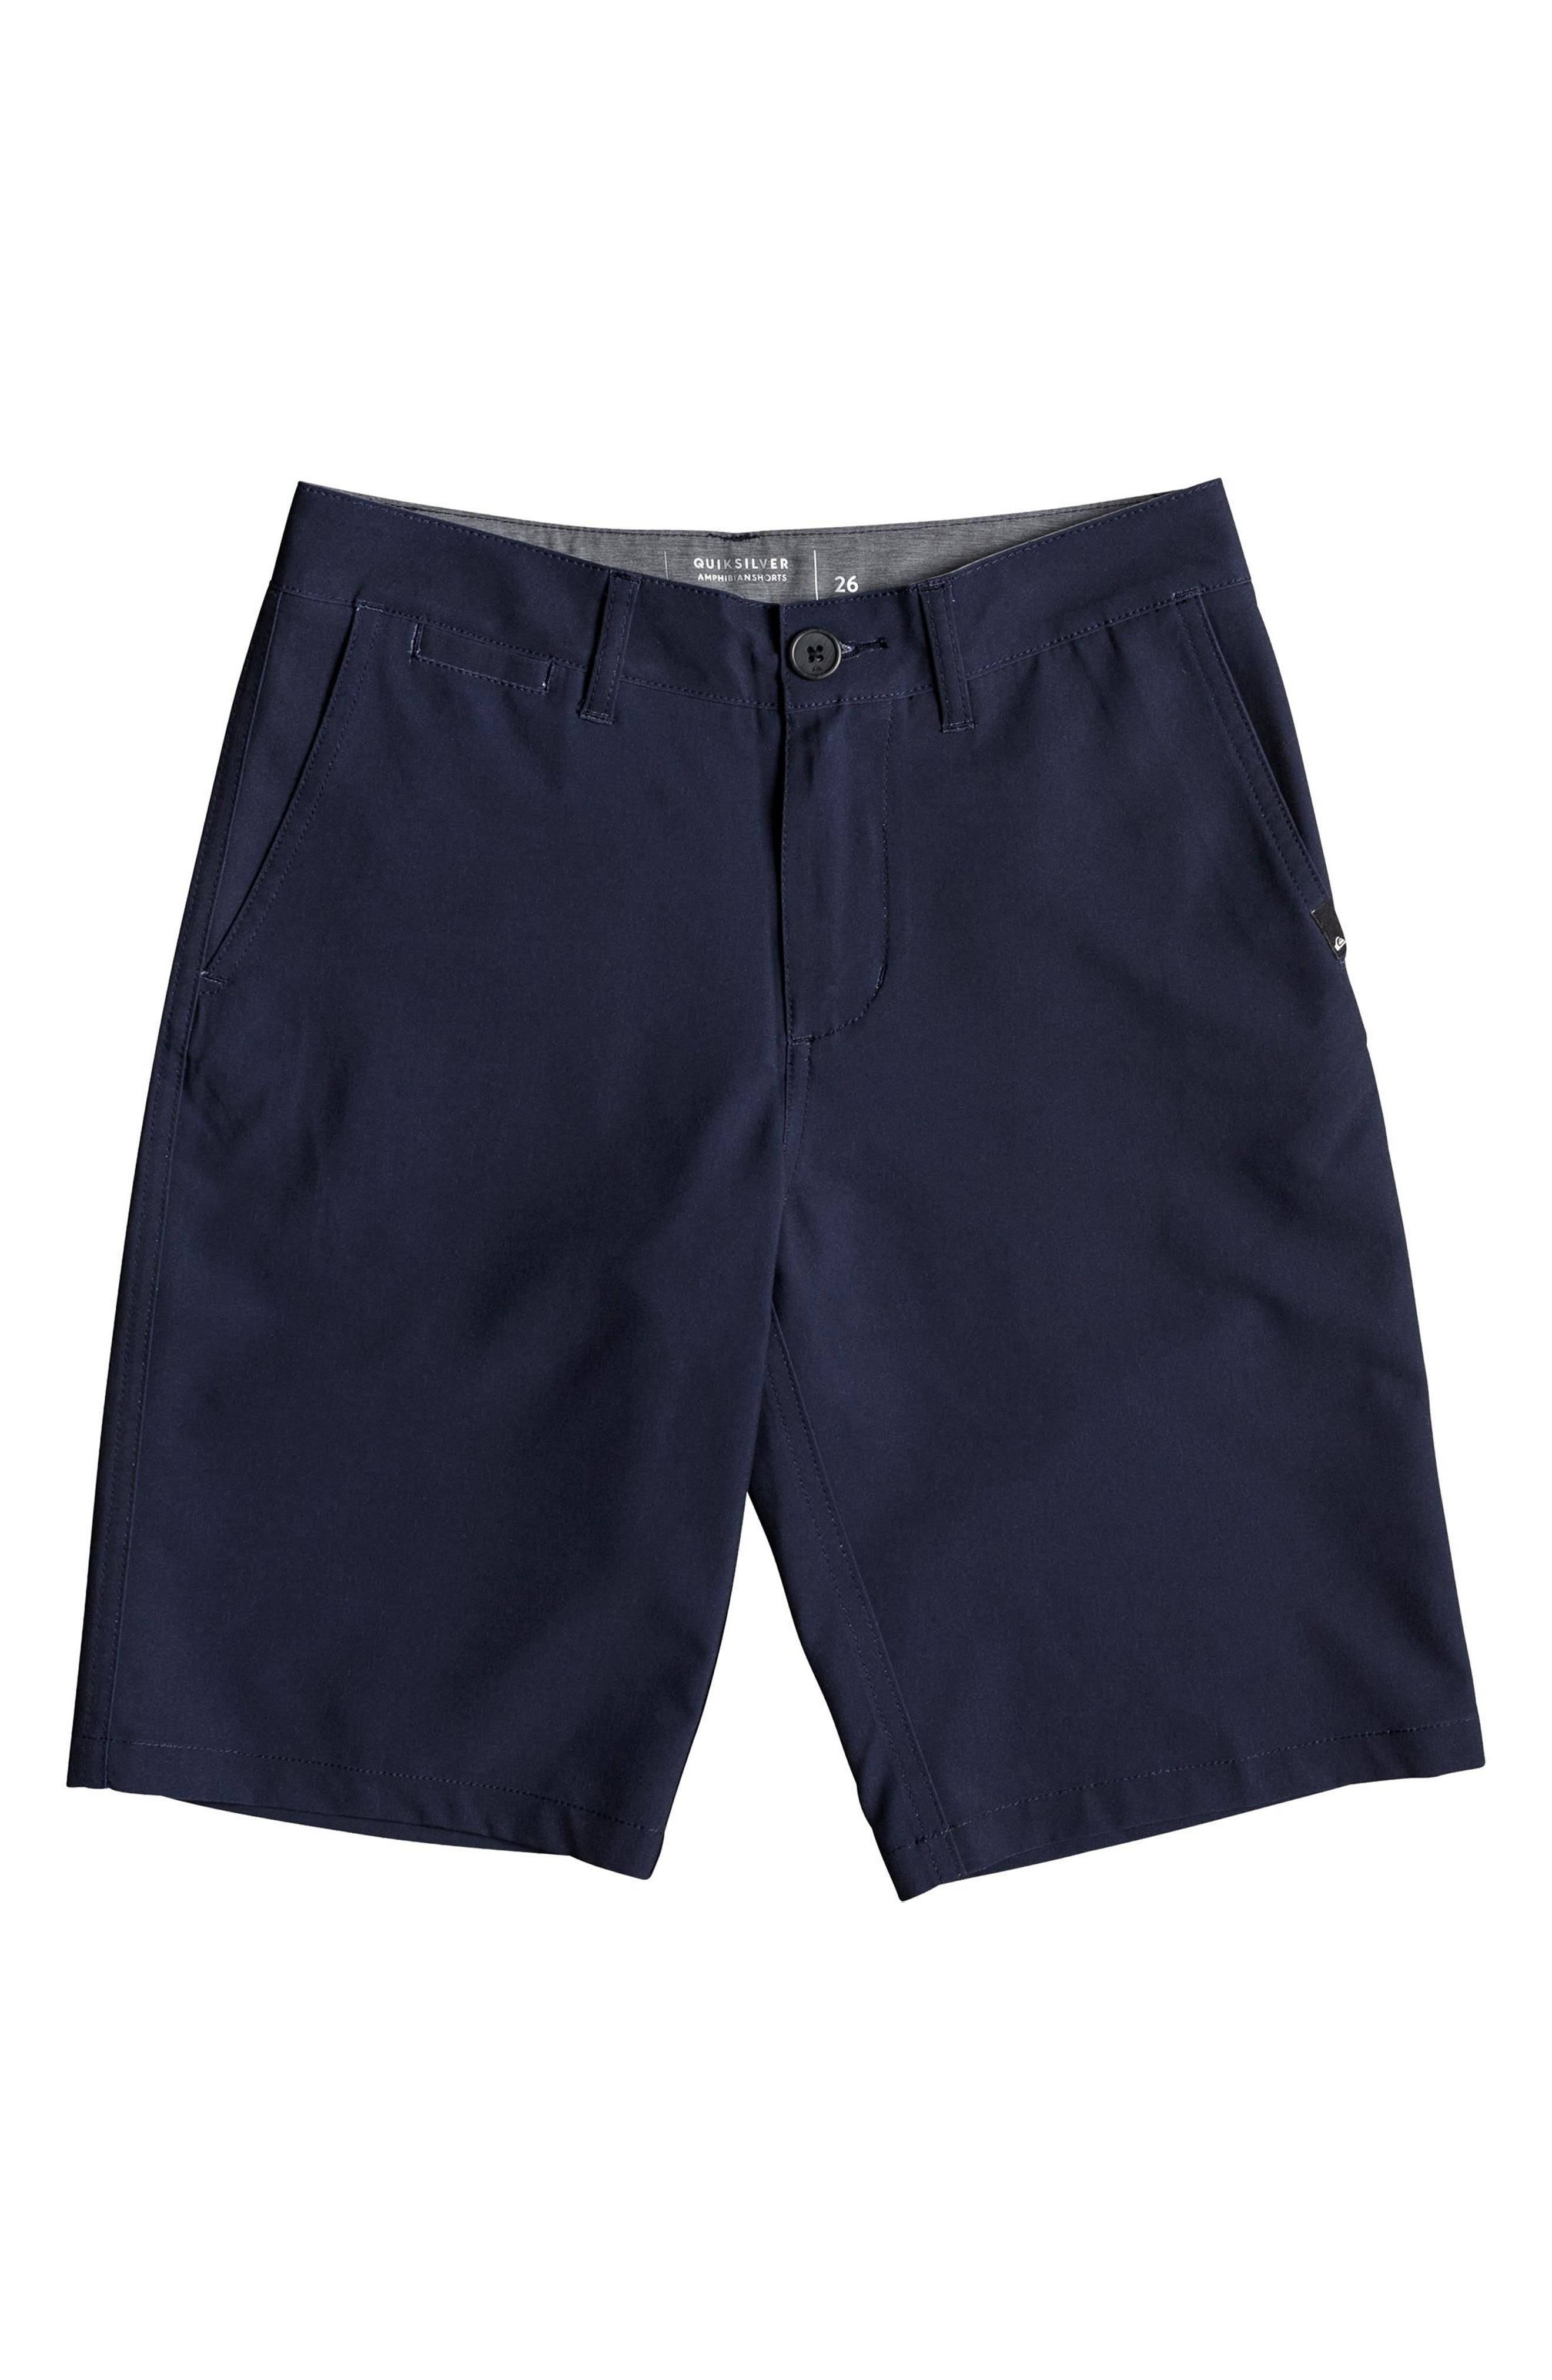 Union Amphibian Hybrid Shorts,                         Main,                         color, Navy Blazer